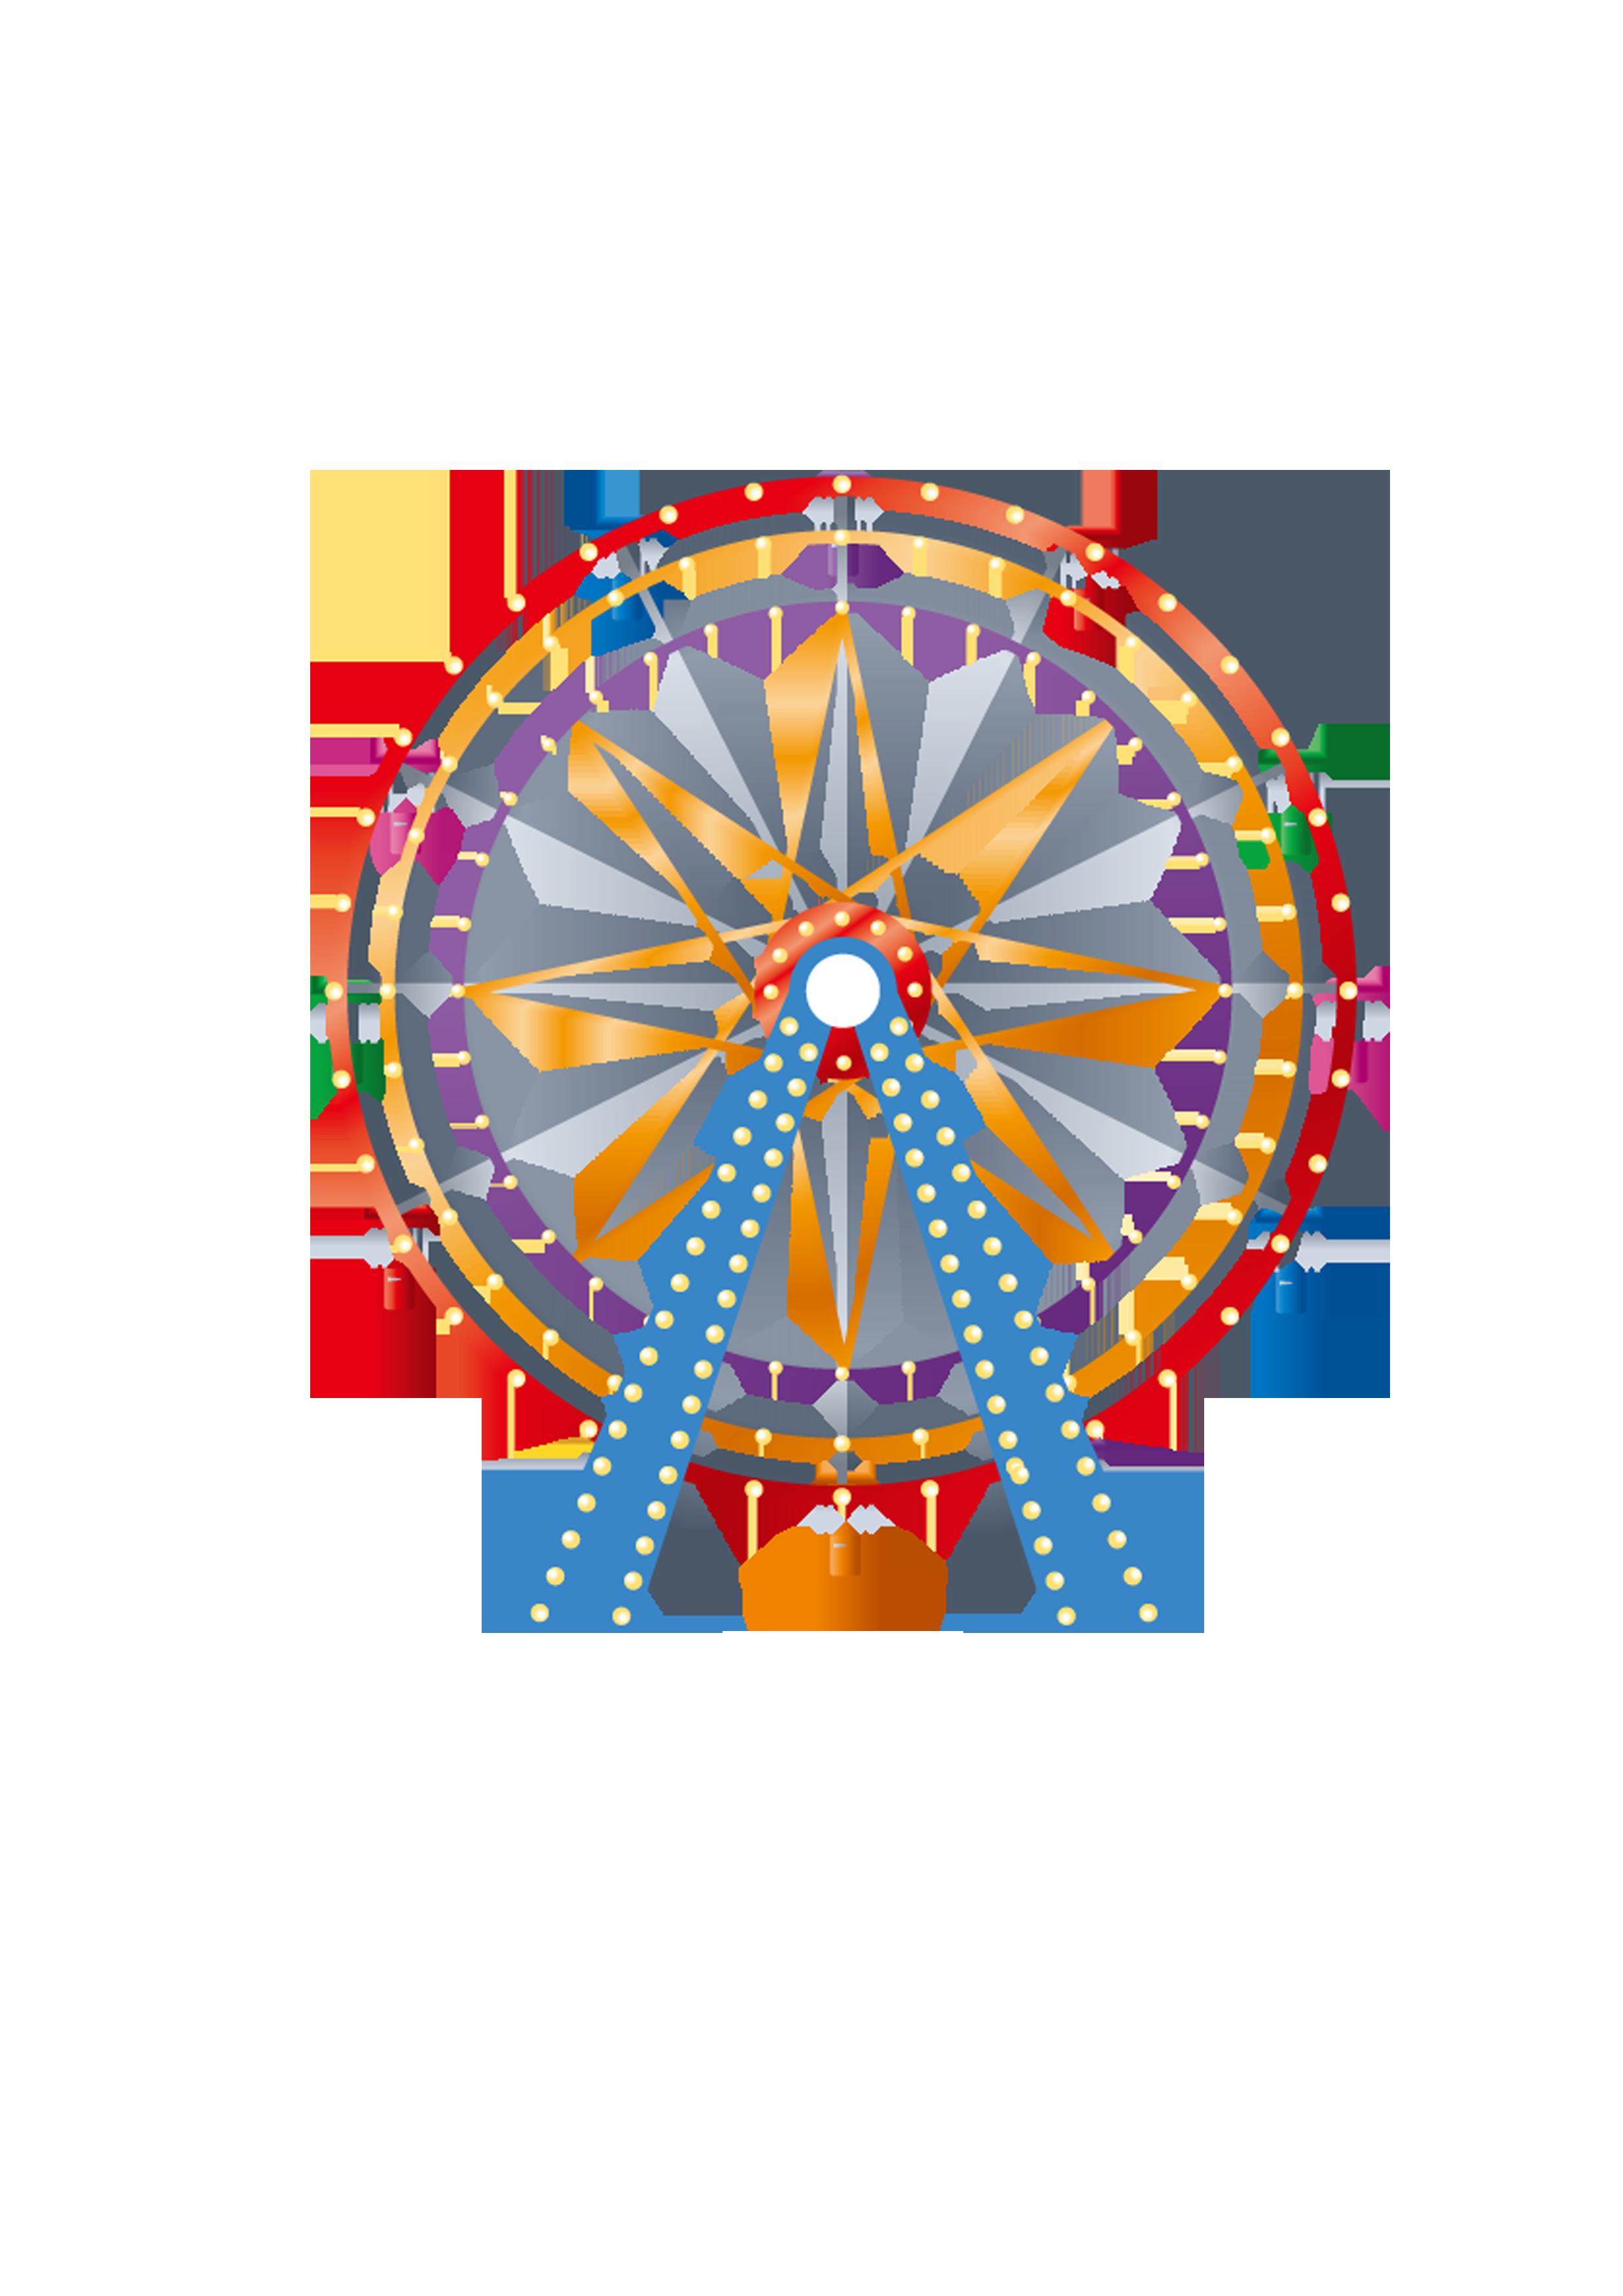 Wheel clipart ferry. Microsoft powerpoint clip art